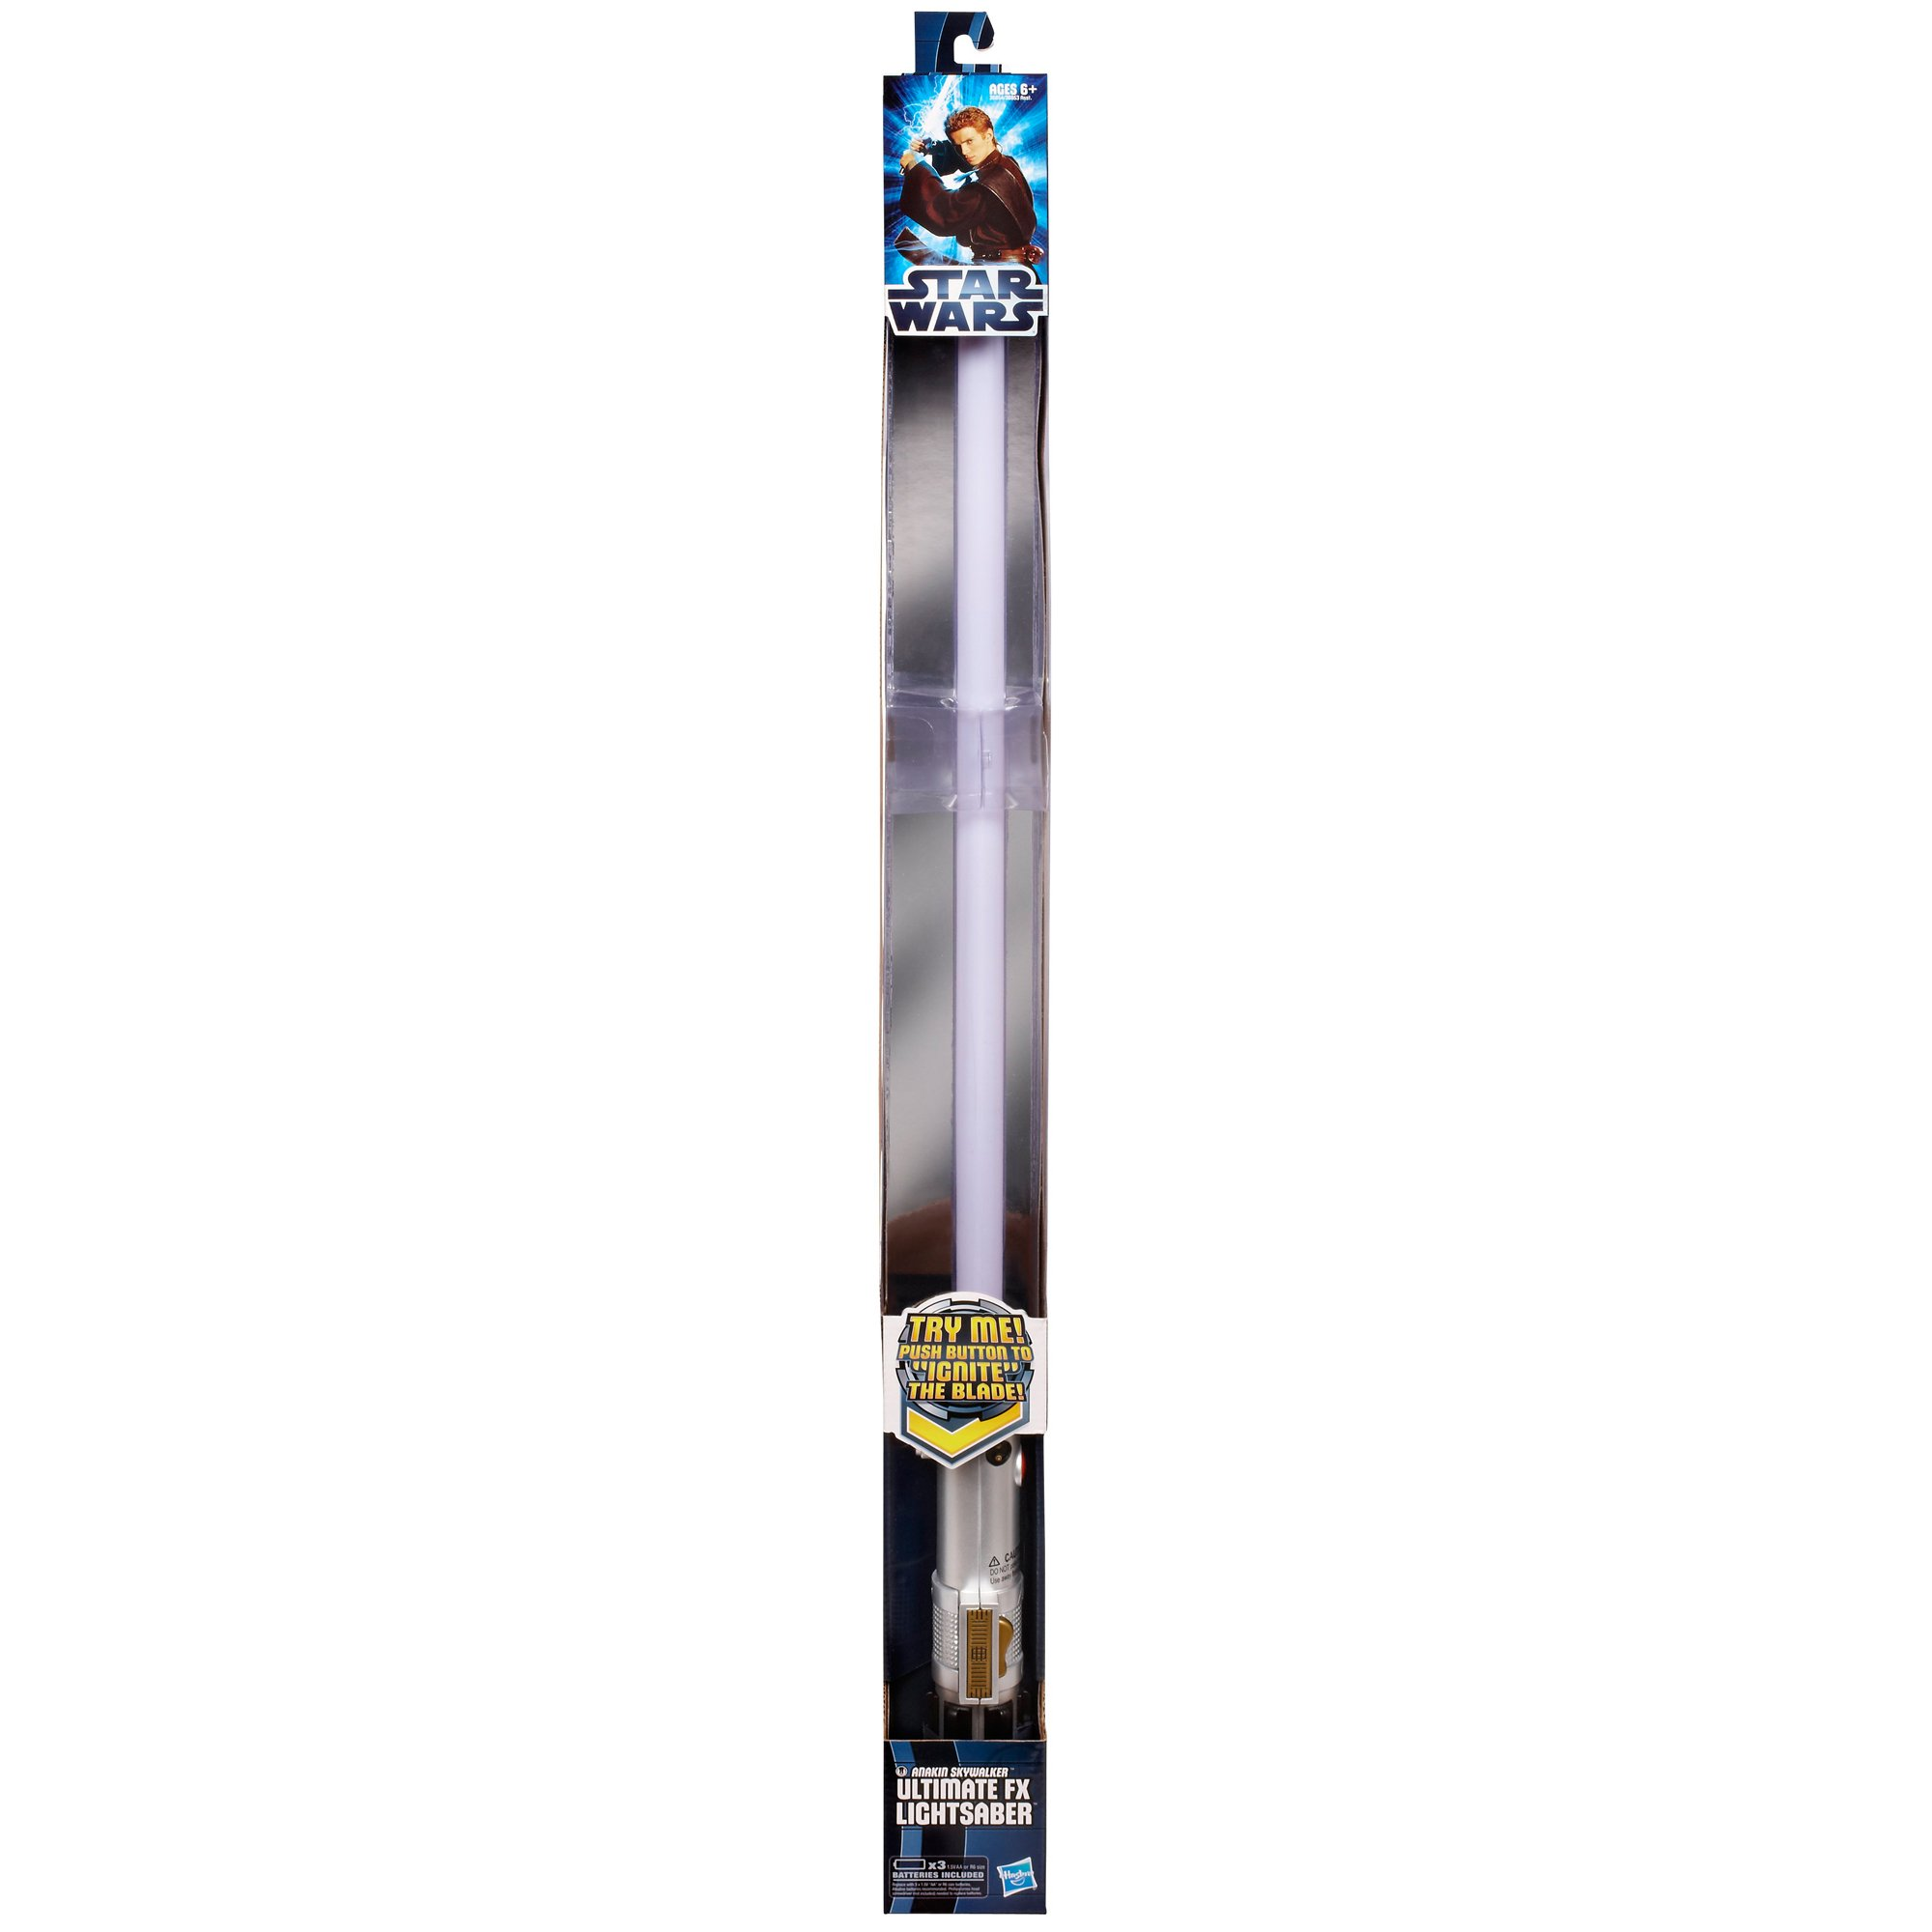 Star Wars Ultimate FX Anakin Lightsaber by Star Wars (Image #3)